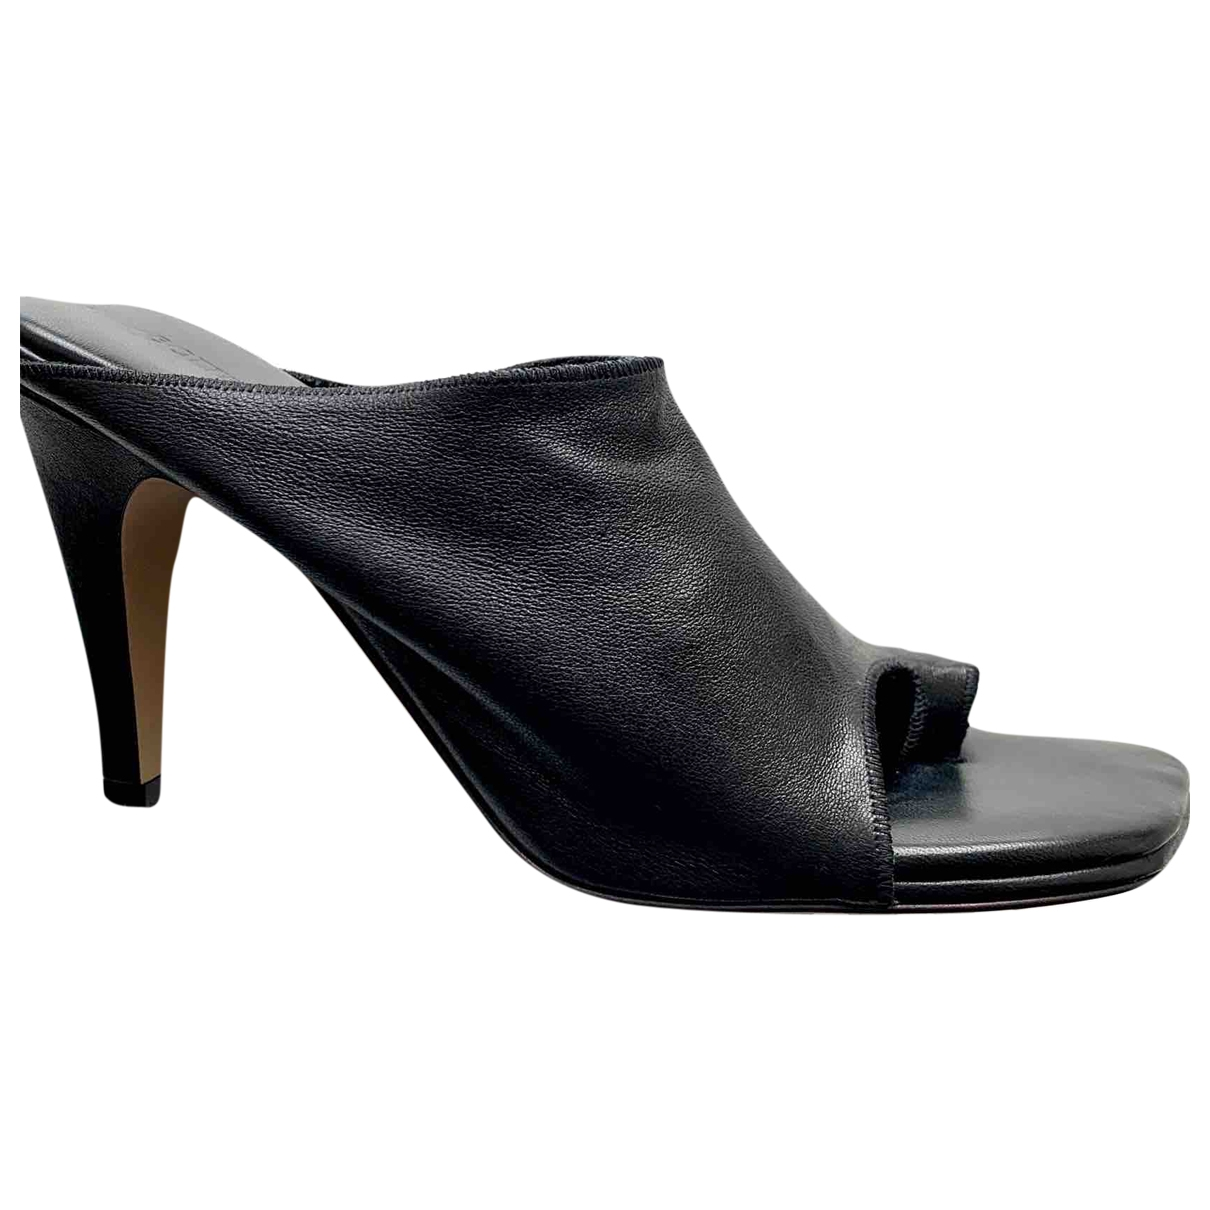 Bottega Veneta Stretch Black Leather Sandals for Women 38 EU